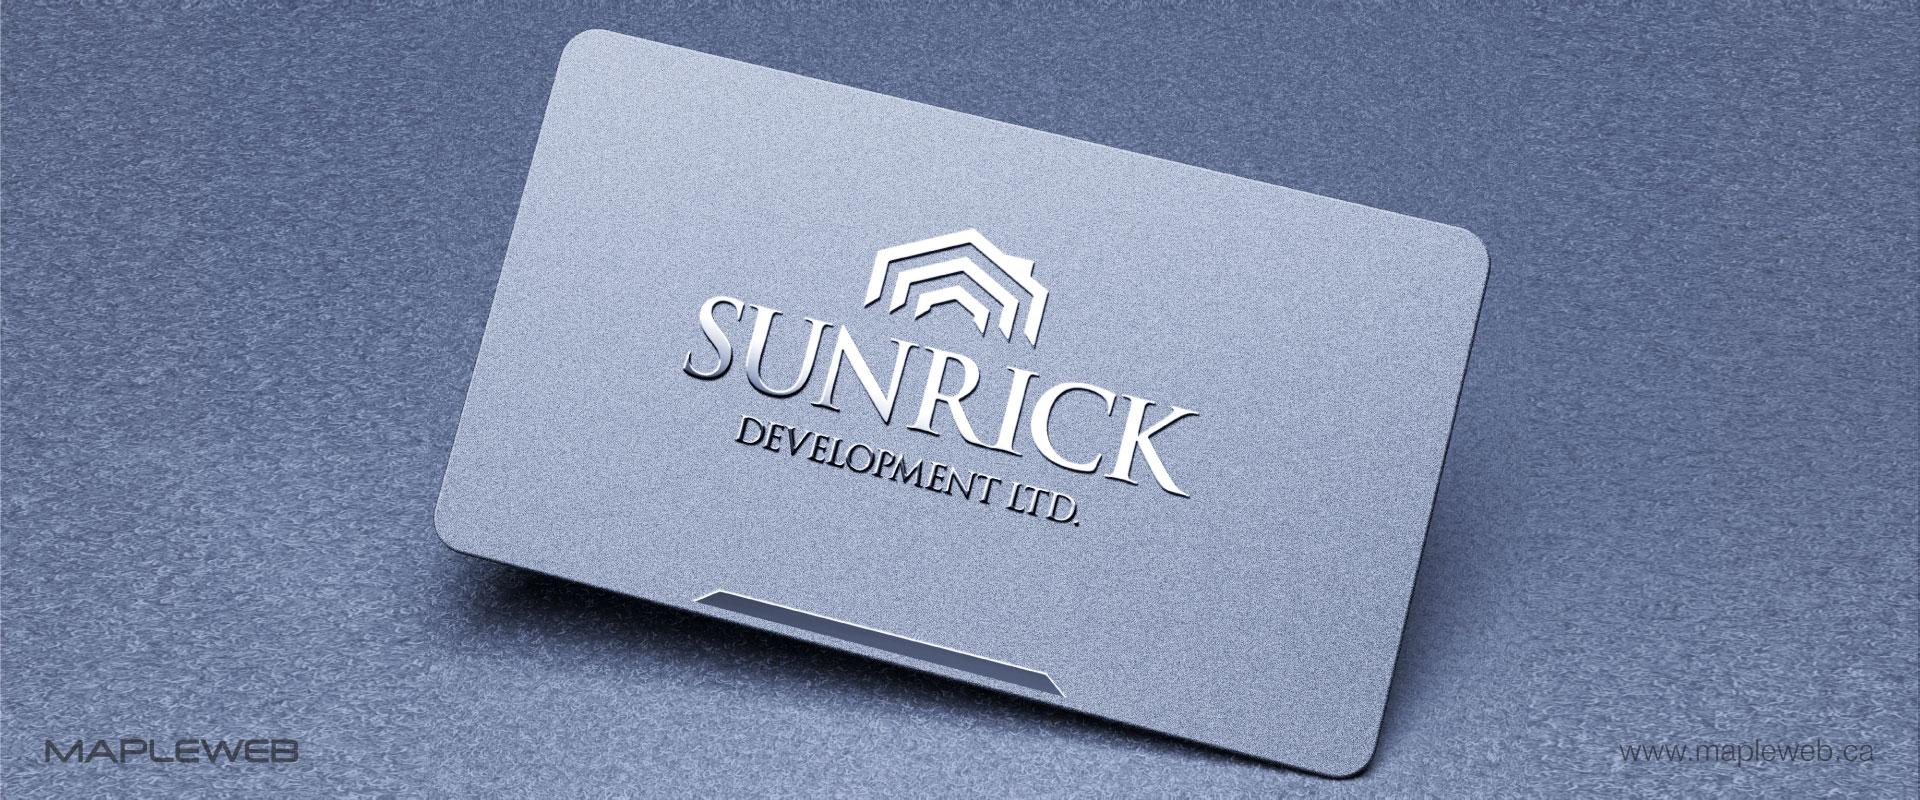 sunrick-development-ltd-brand-logo-design-by-mapleweb-vancouver-canada-business-card-noisy-mock